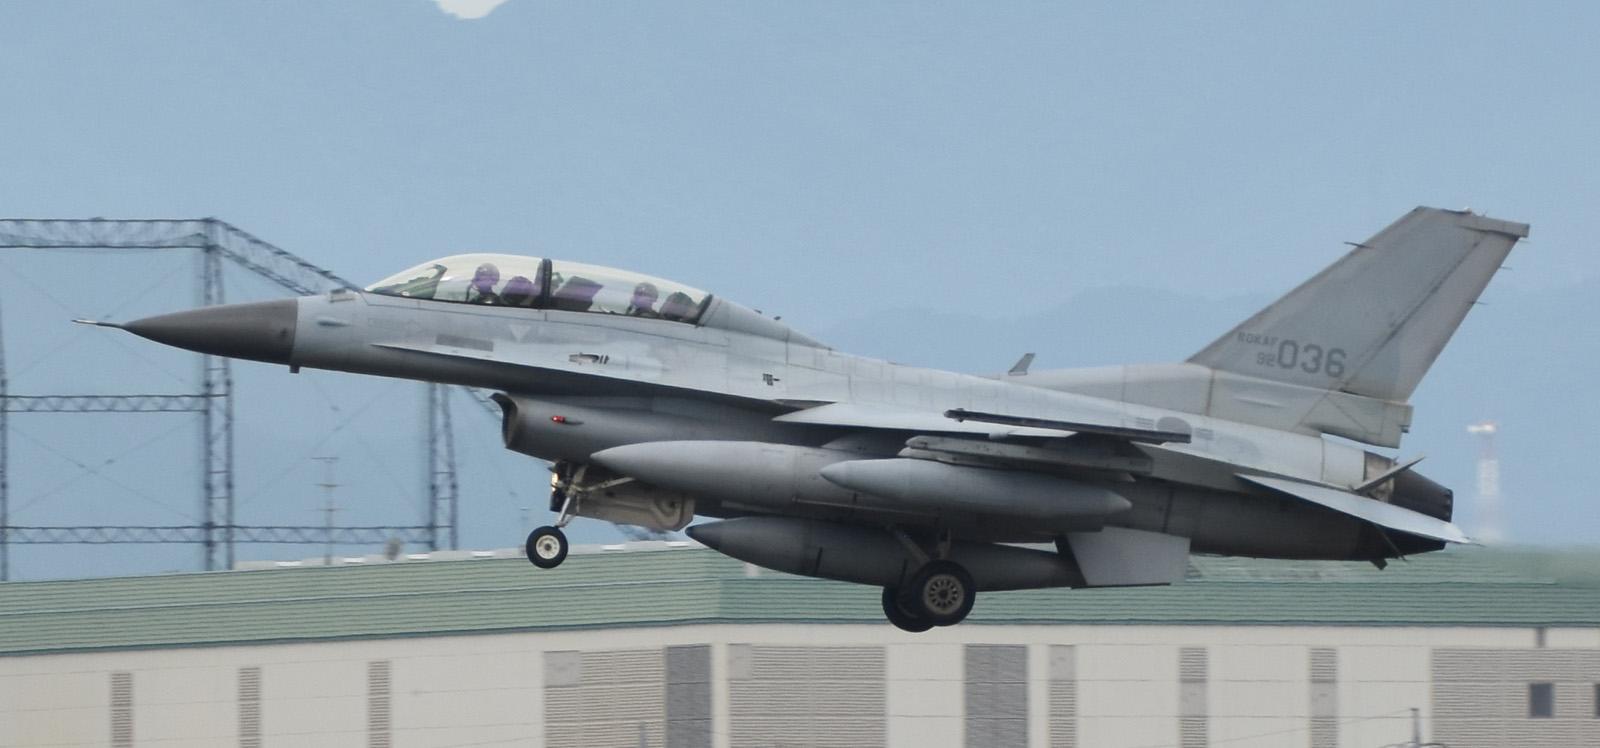 F16d170601g535